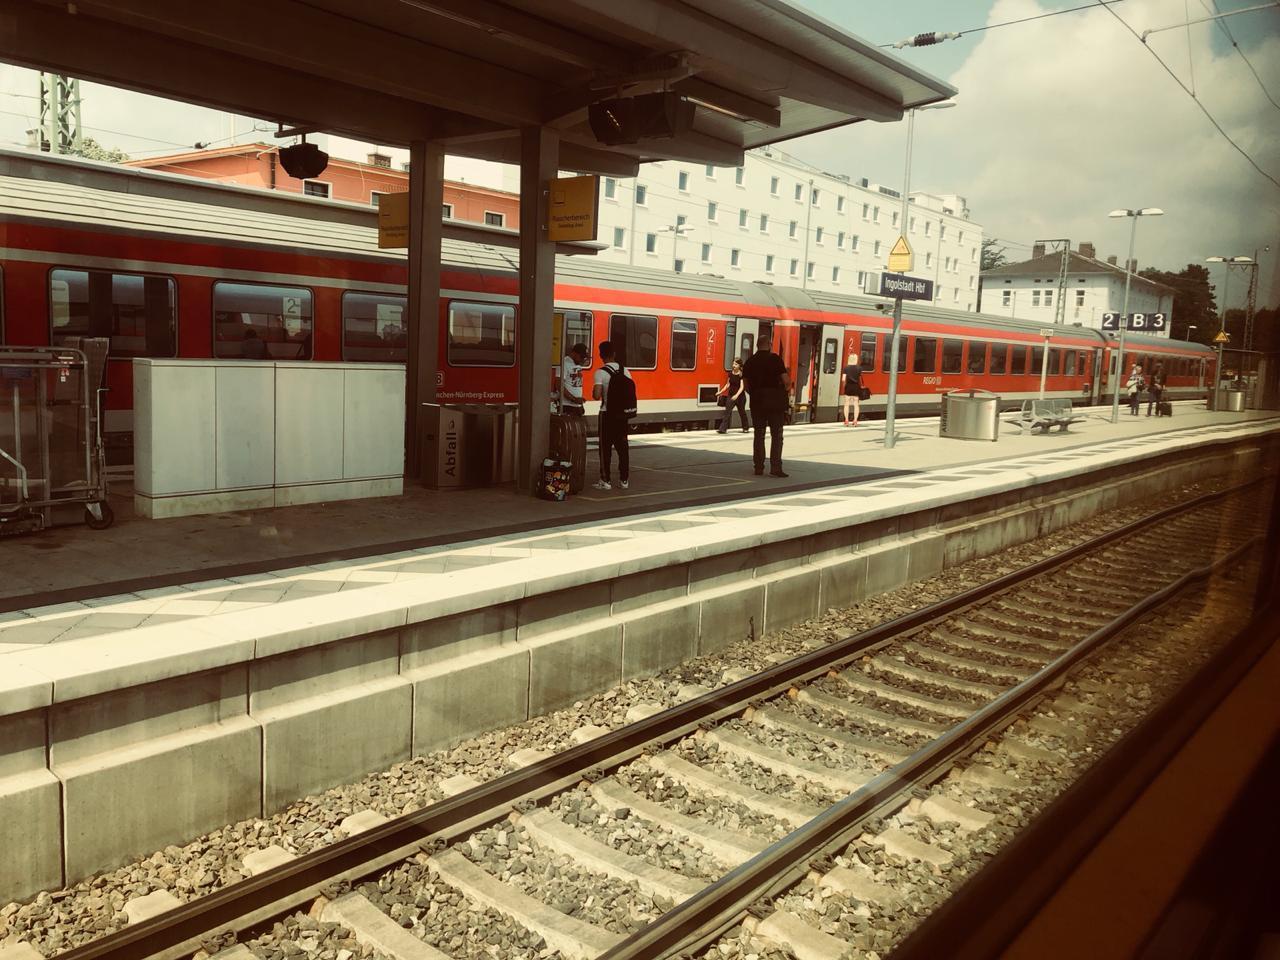 Bahnhof_Du_musst